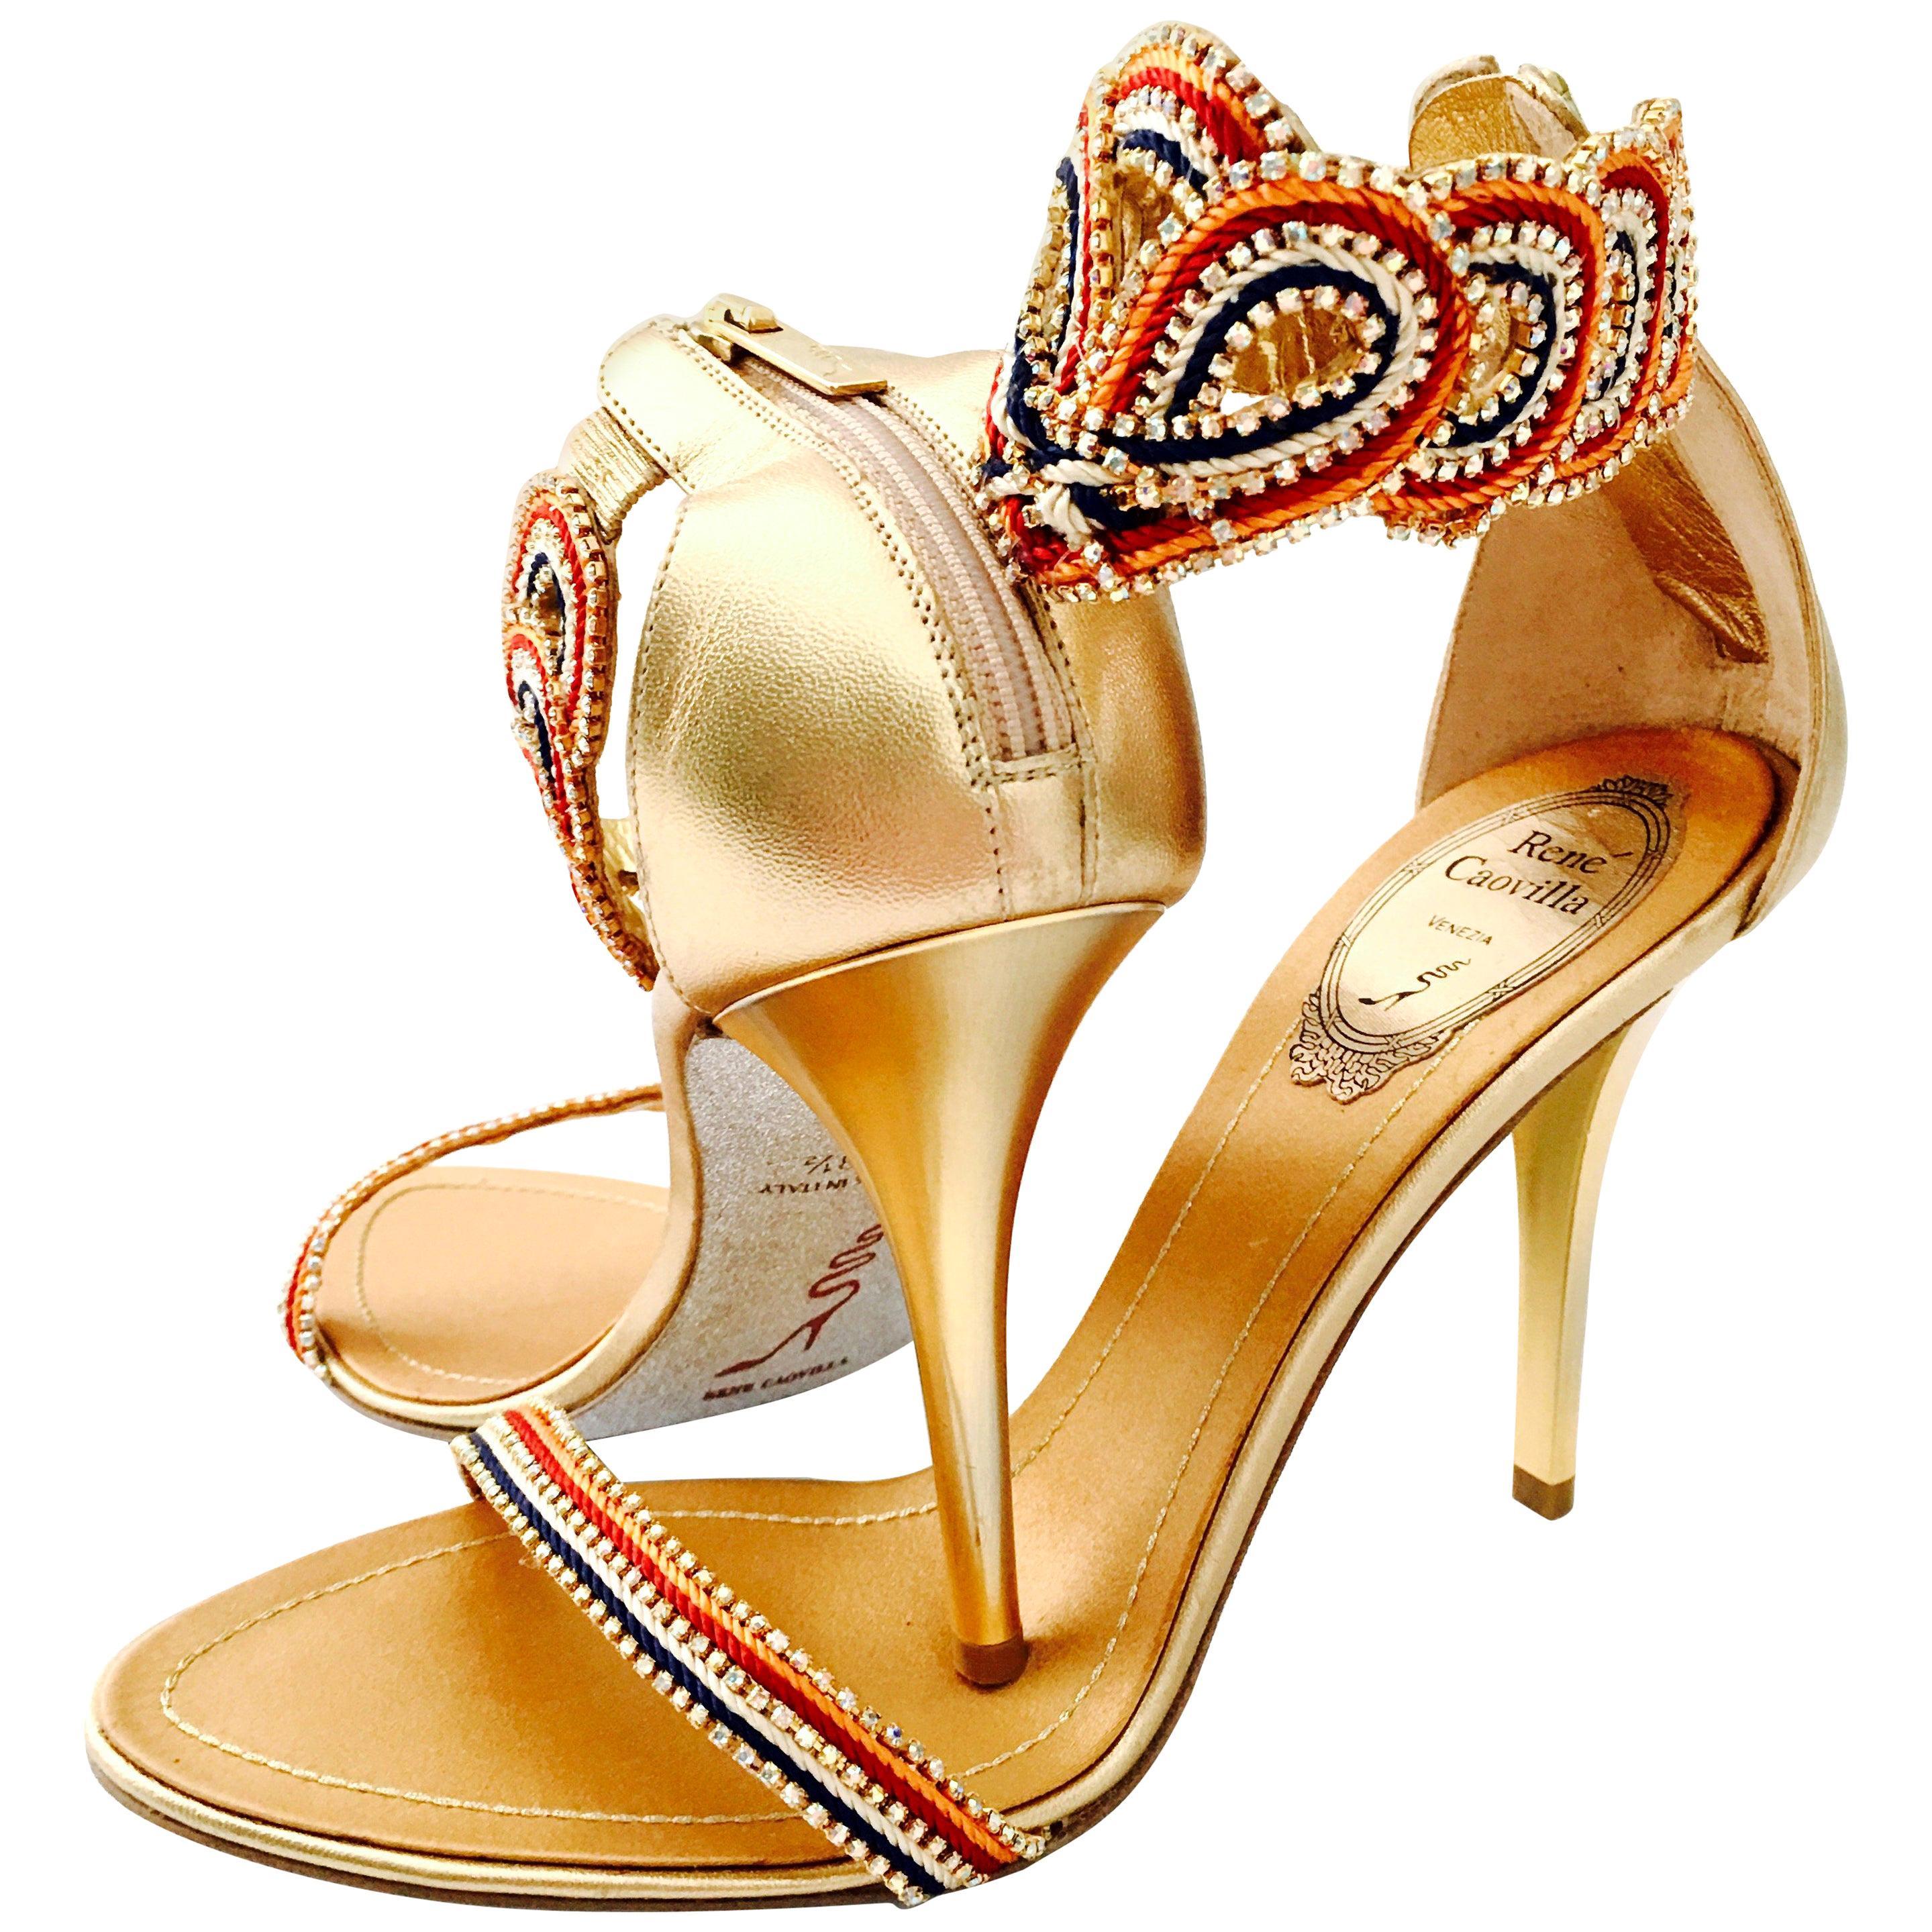 21st Century New Rene Caovilla Metallic Embellished Ankle Wrap Sandals